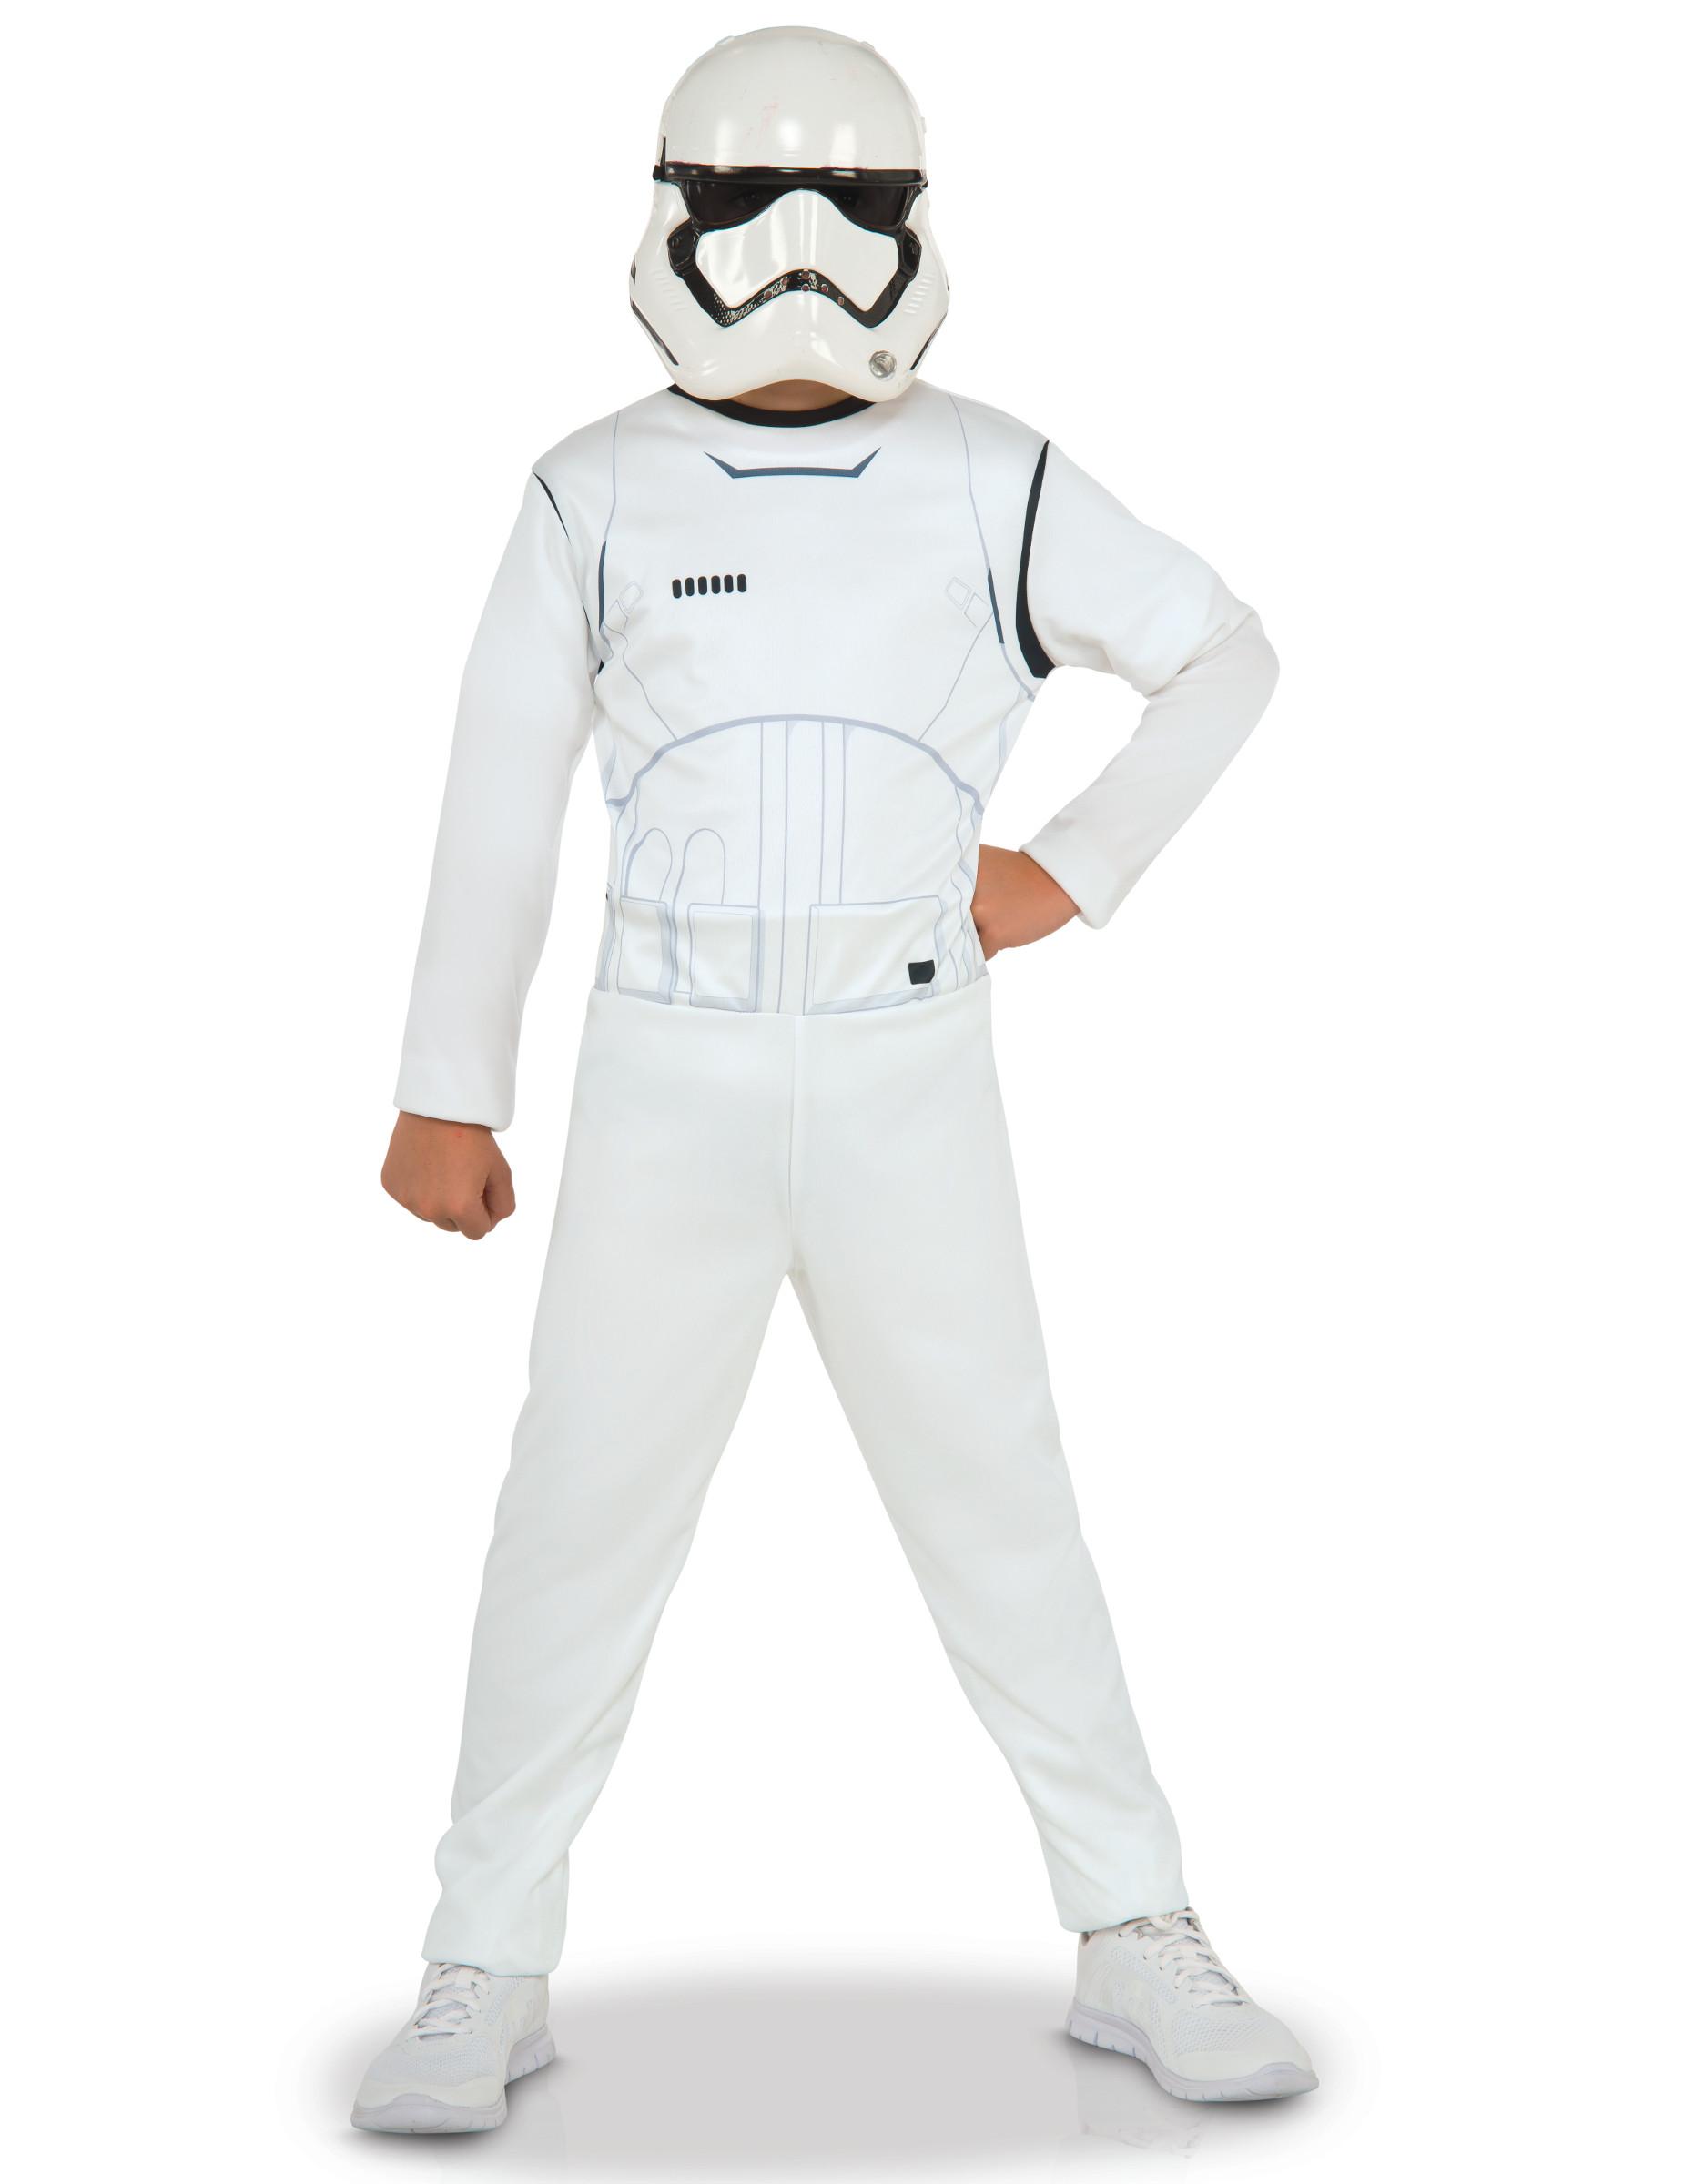 star wars stormtrooper kinderkost m lizenzprodukt weiss. Black Bedroom Furniture Sets. Home Design Ideas